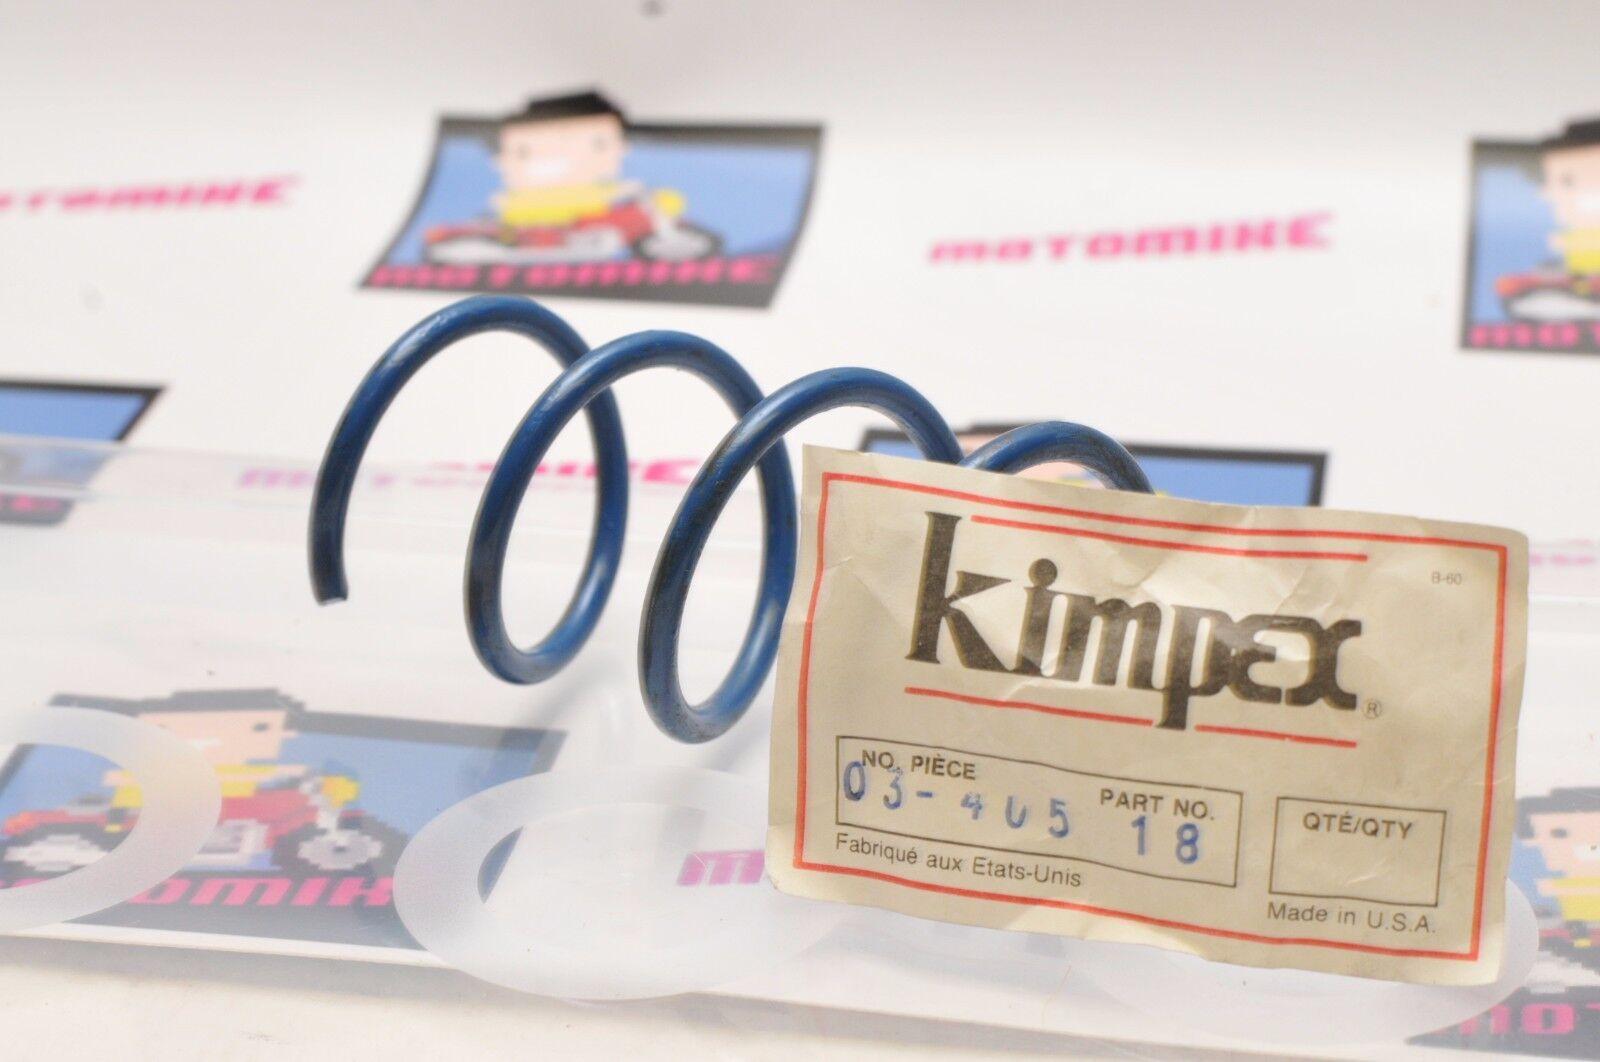 KIMPEX CLUTCH SPRING 03-405-18 BLUE